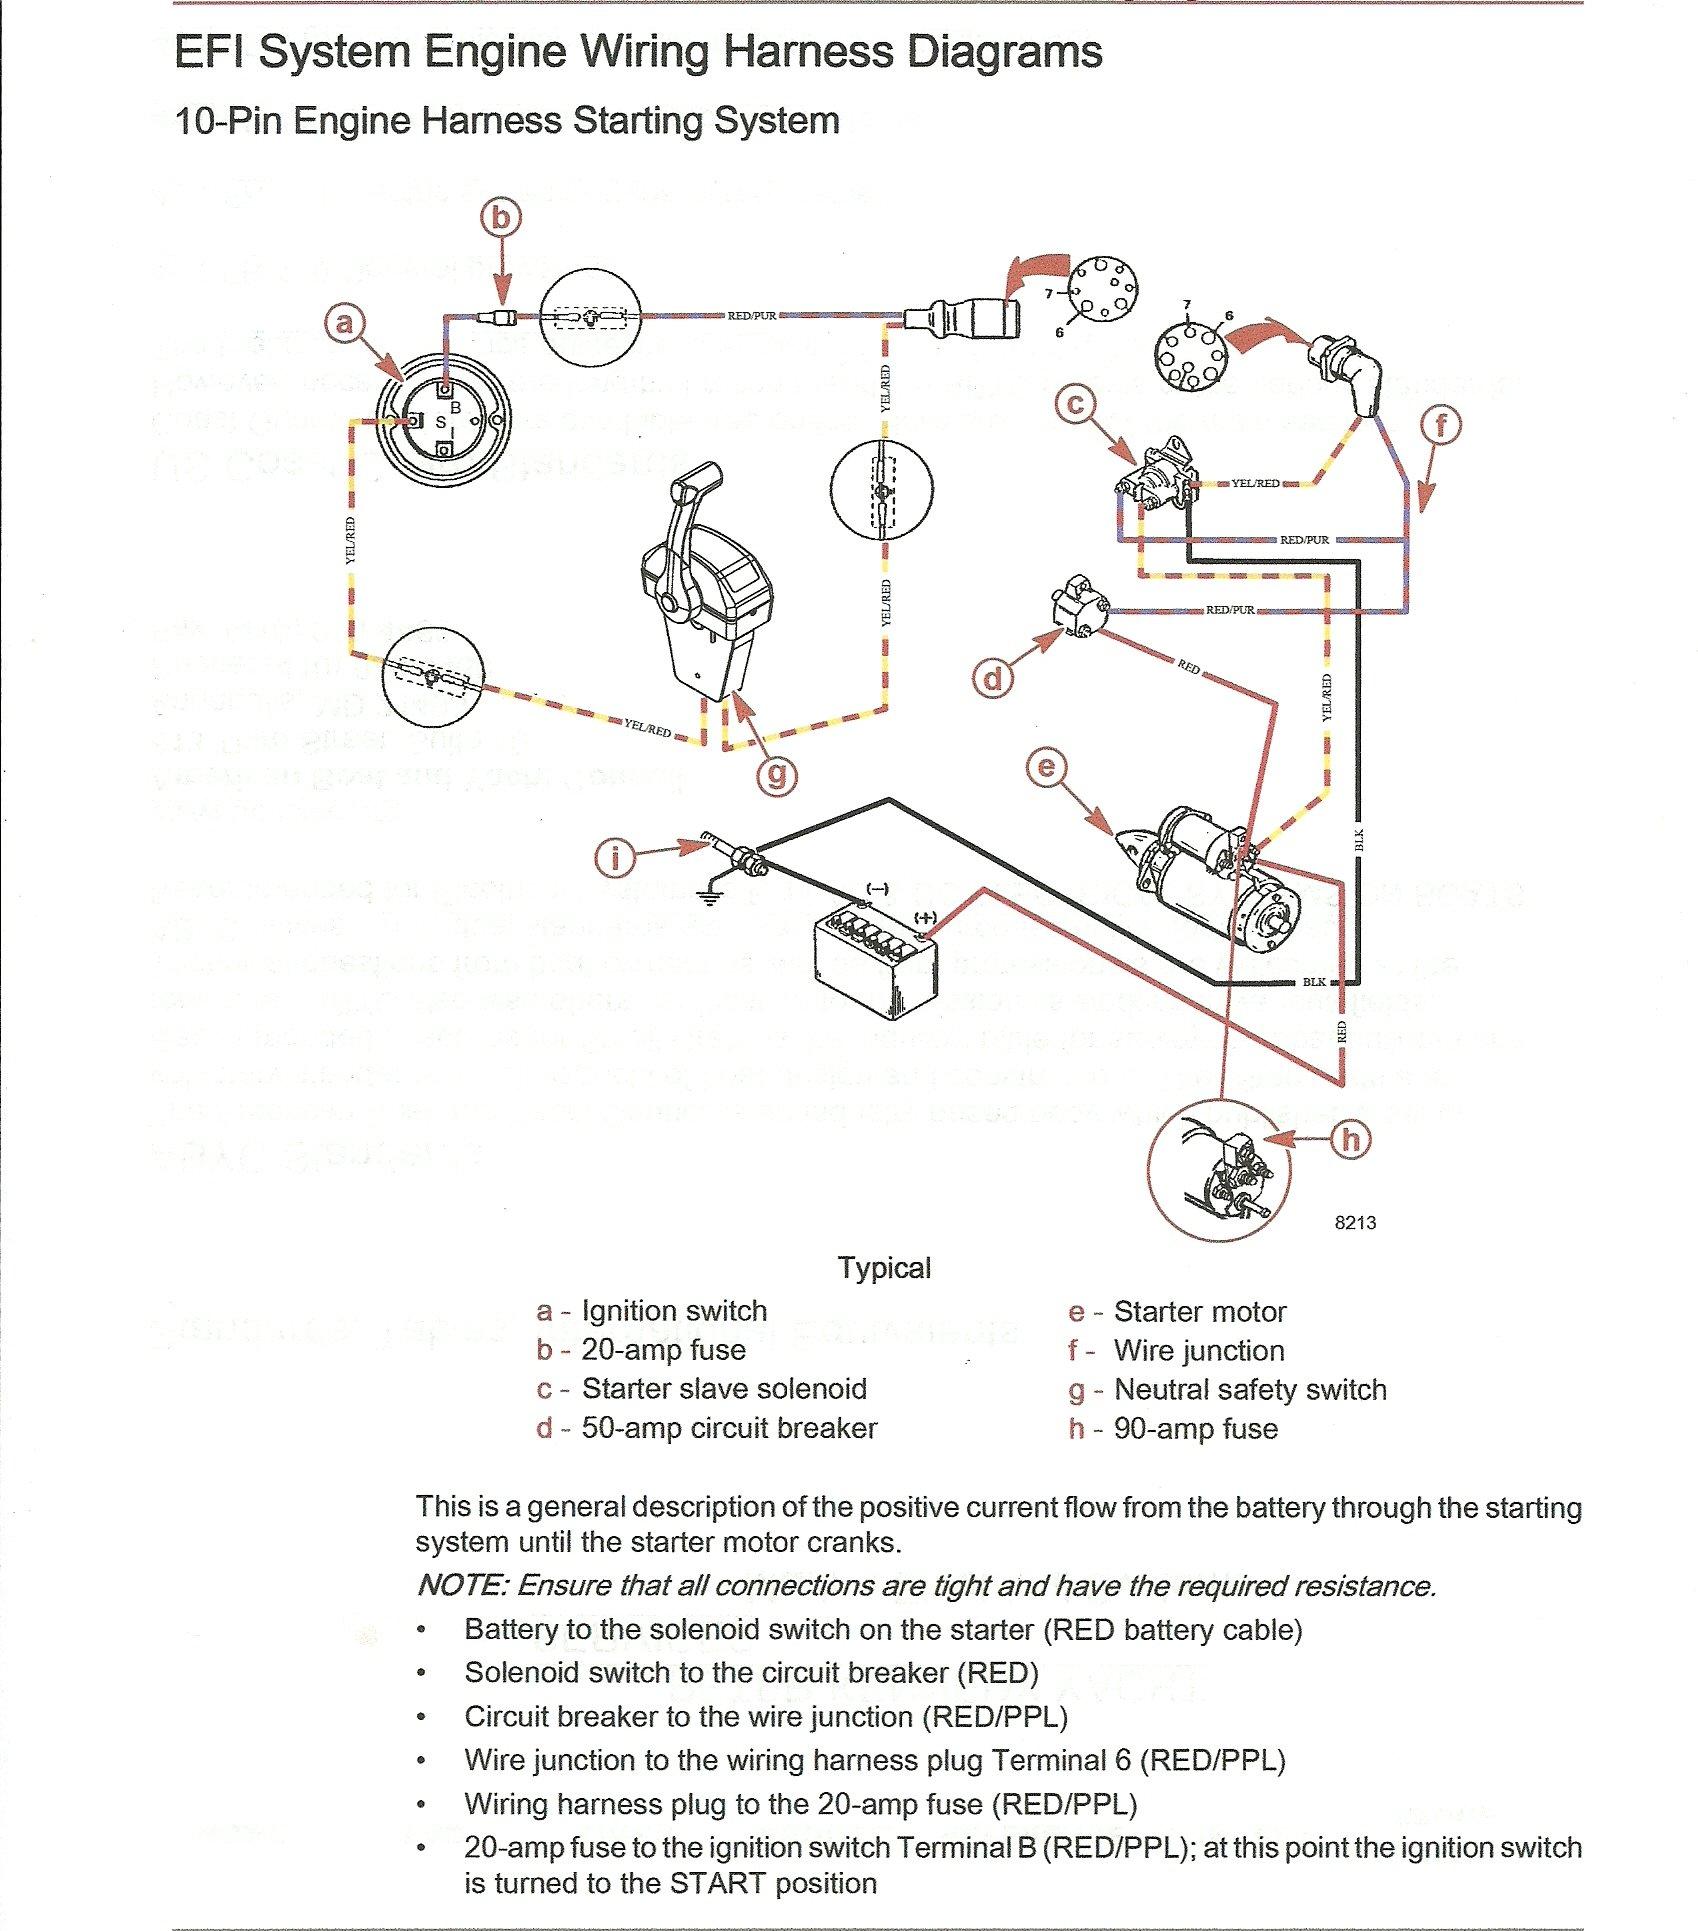 Have 2003 Merc  350 Single Prop  21 U0026 39  Rinker  Starter Motor Seems To Be Failing  Turns The Motor